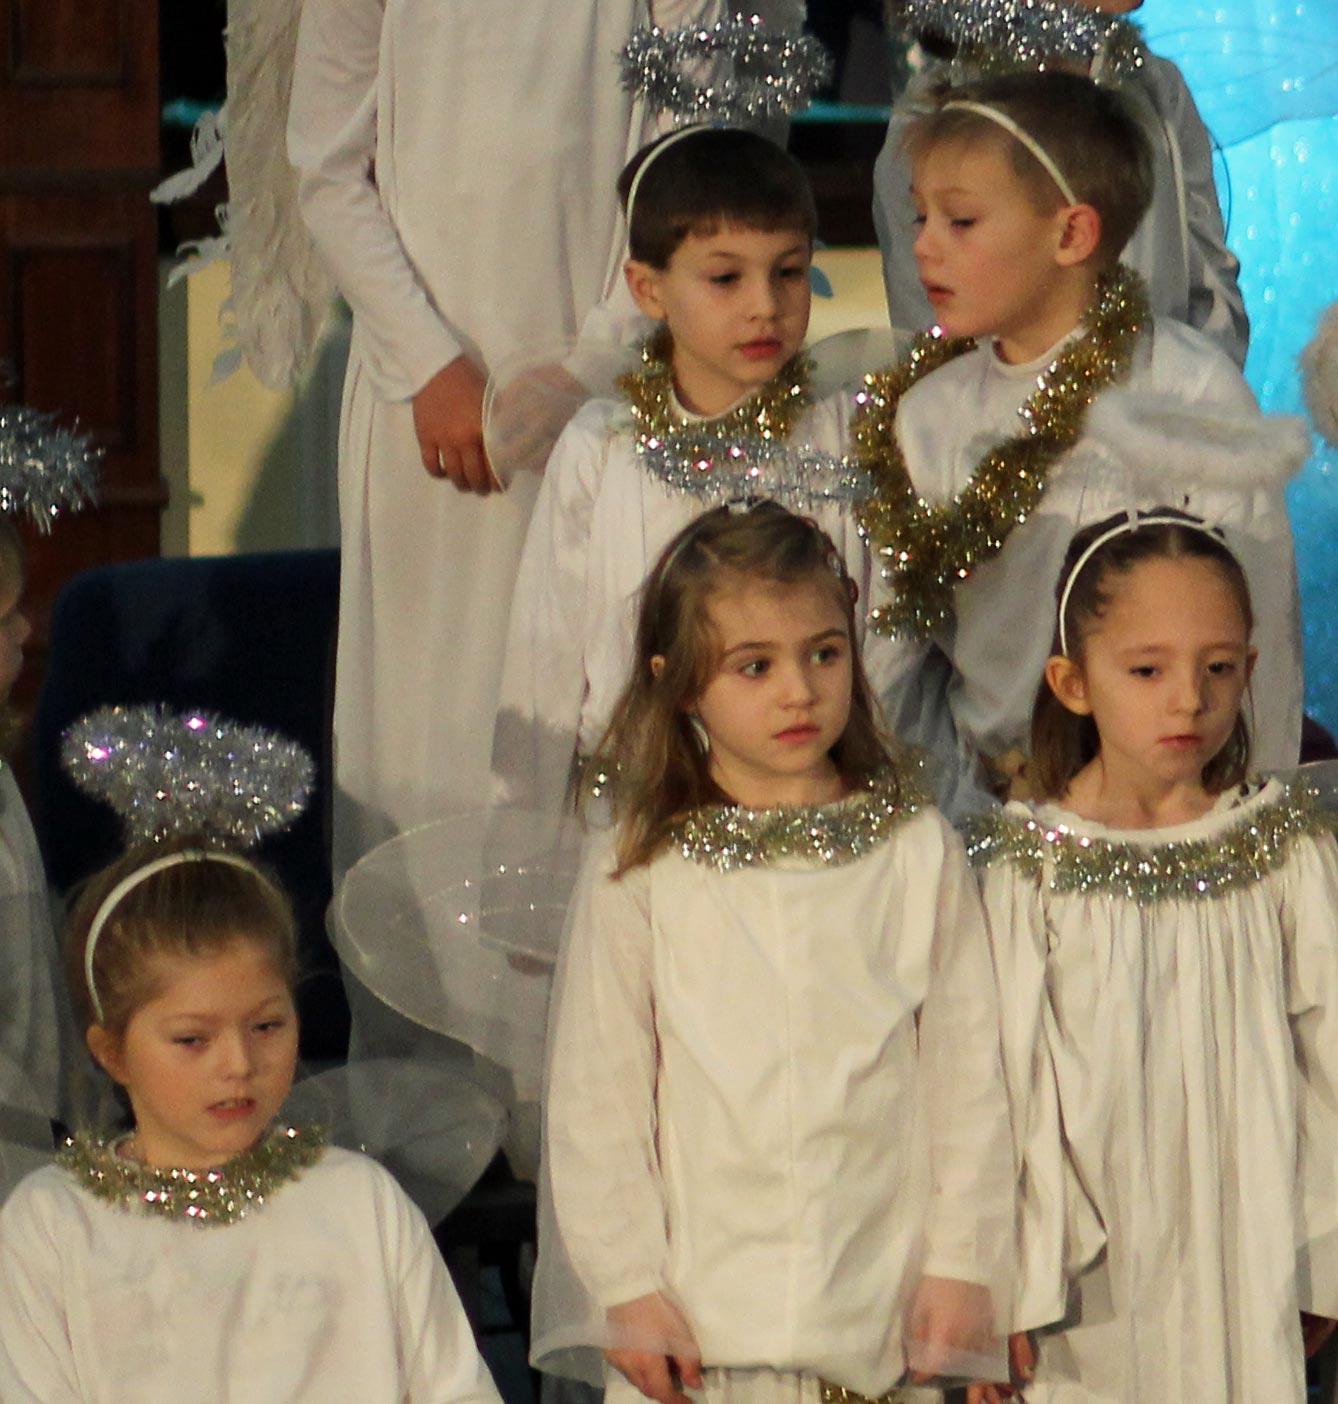 Children S: Hope Community Church Children's Christmas Pageant